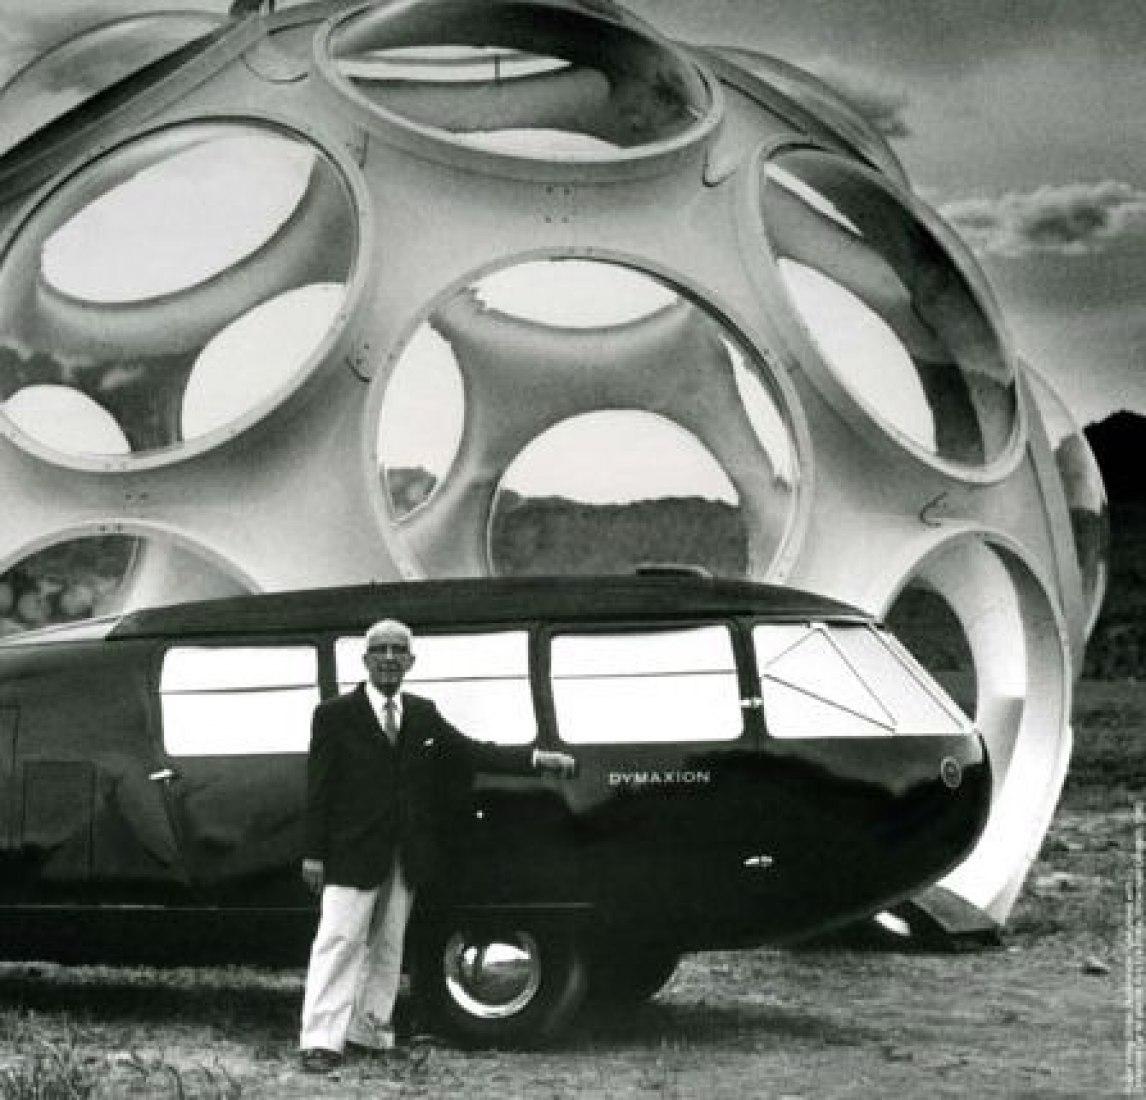 Fuller and the Dymaxion Car No. 3.